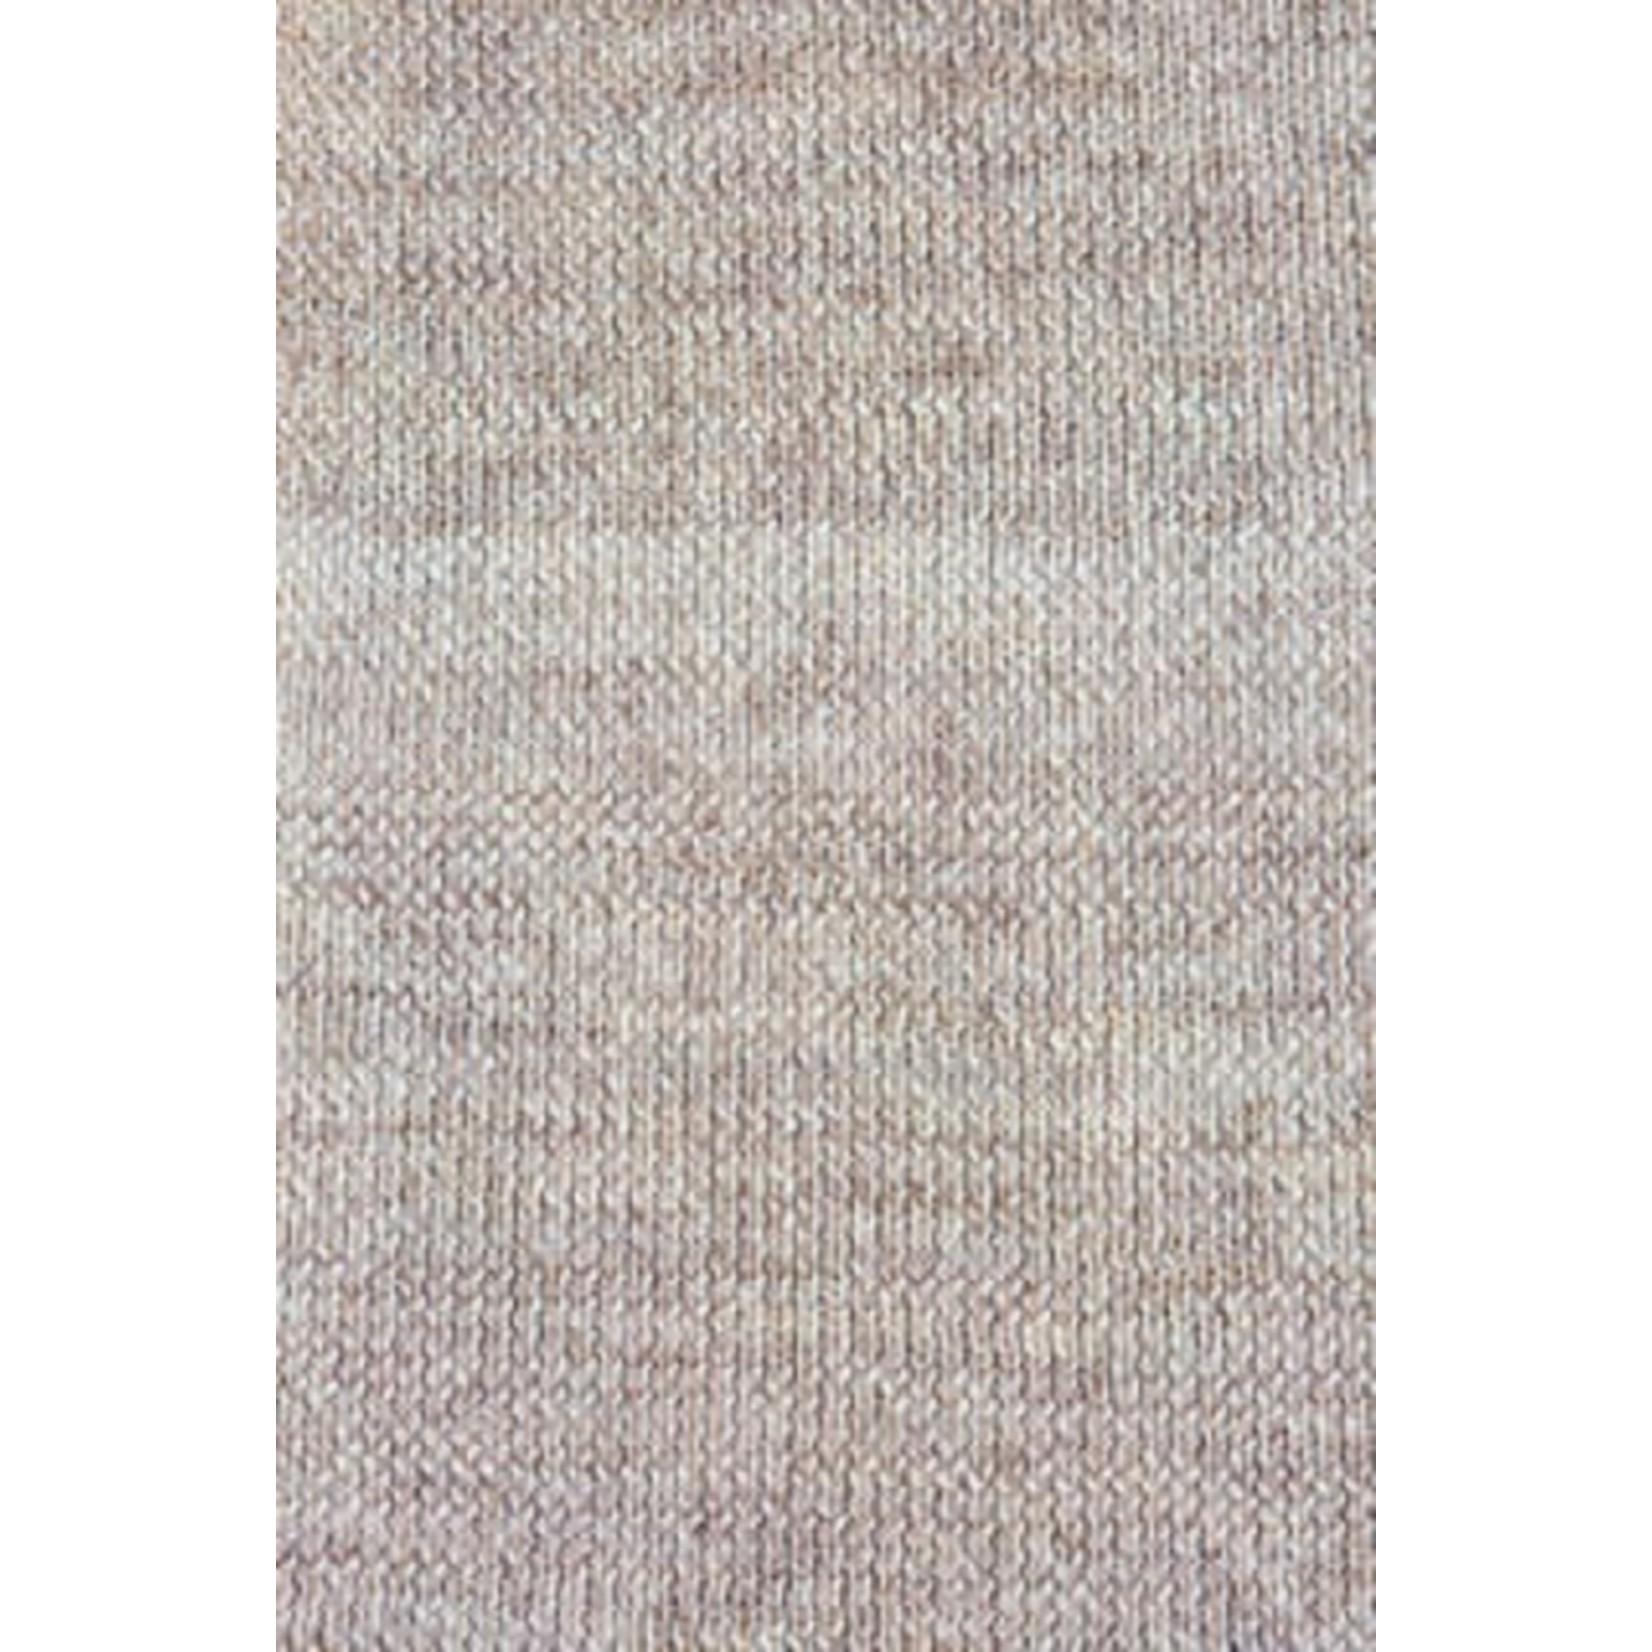 Pollen Sweaters Inc. Pollen Sweaters Wool Crewneck Sweater - 3 Colors